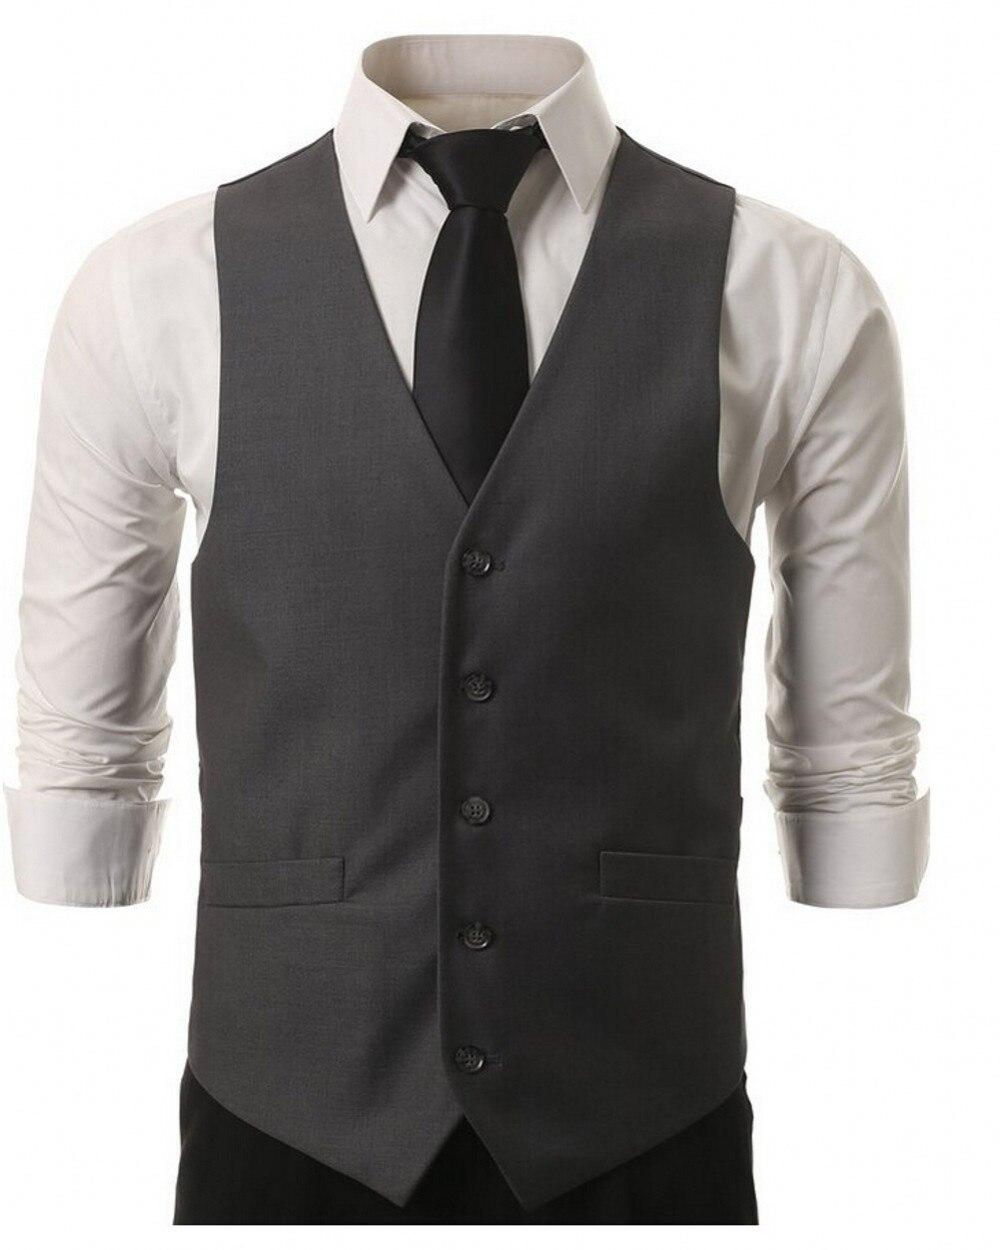 2017 New high quality men suit Black Grey vest men waistcoat dress vests for men New men's solid color Slim Menvest